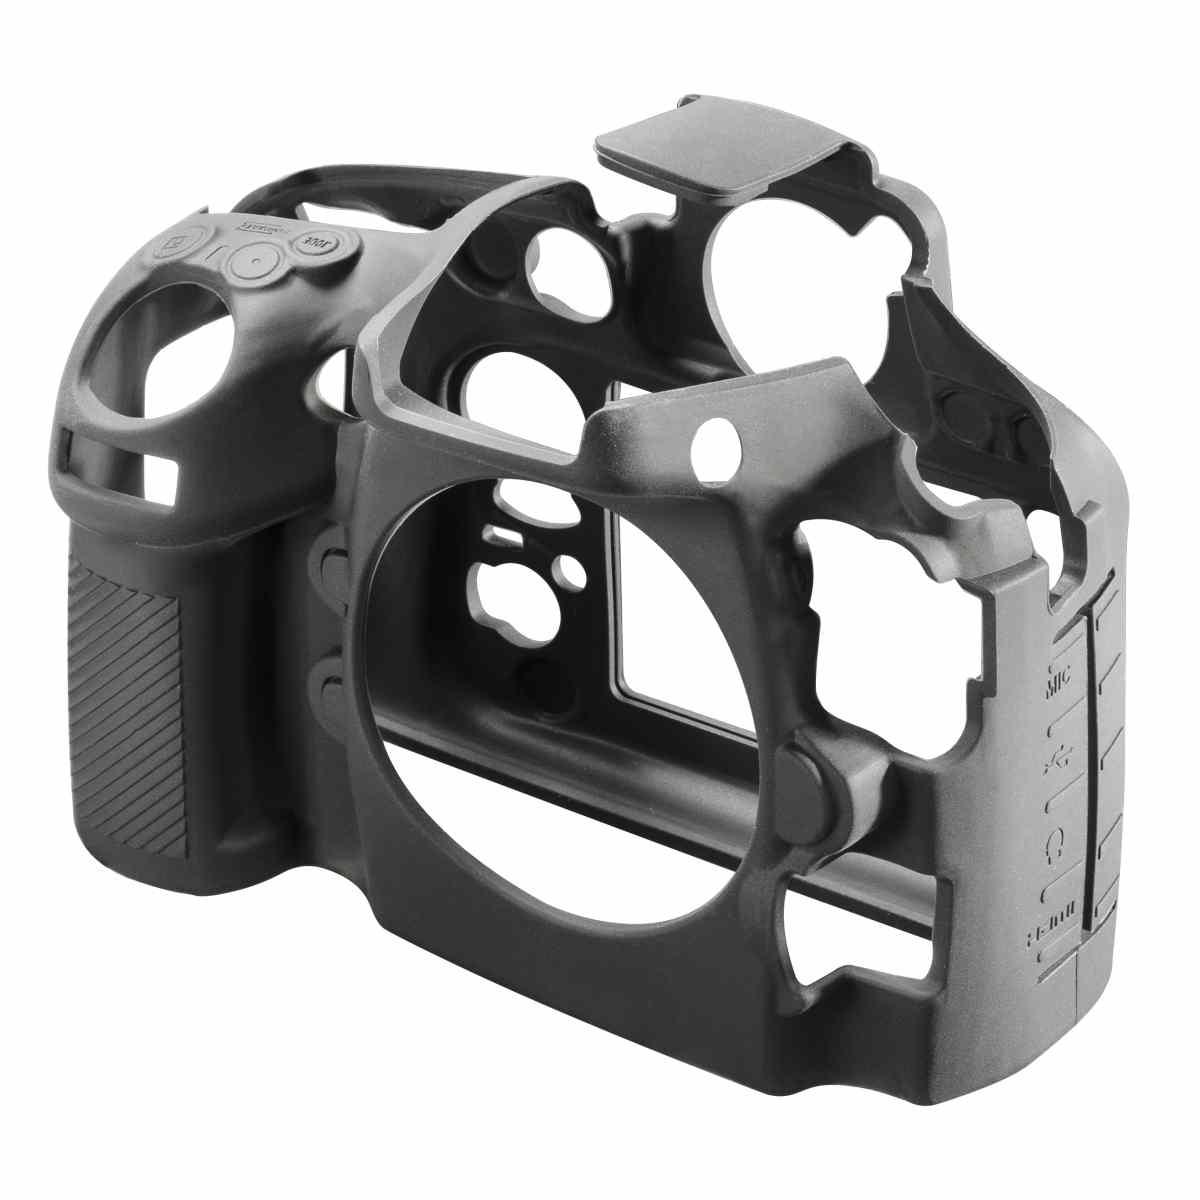 Walimex pro easyCover for Nikon D800 D800E